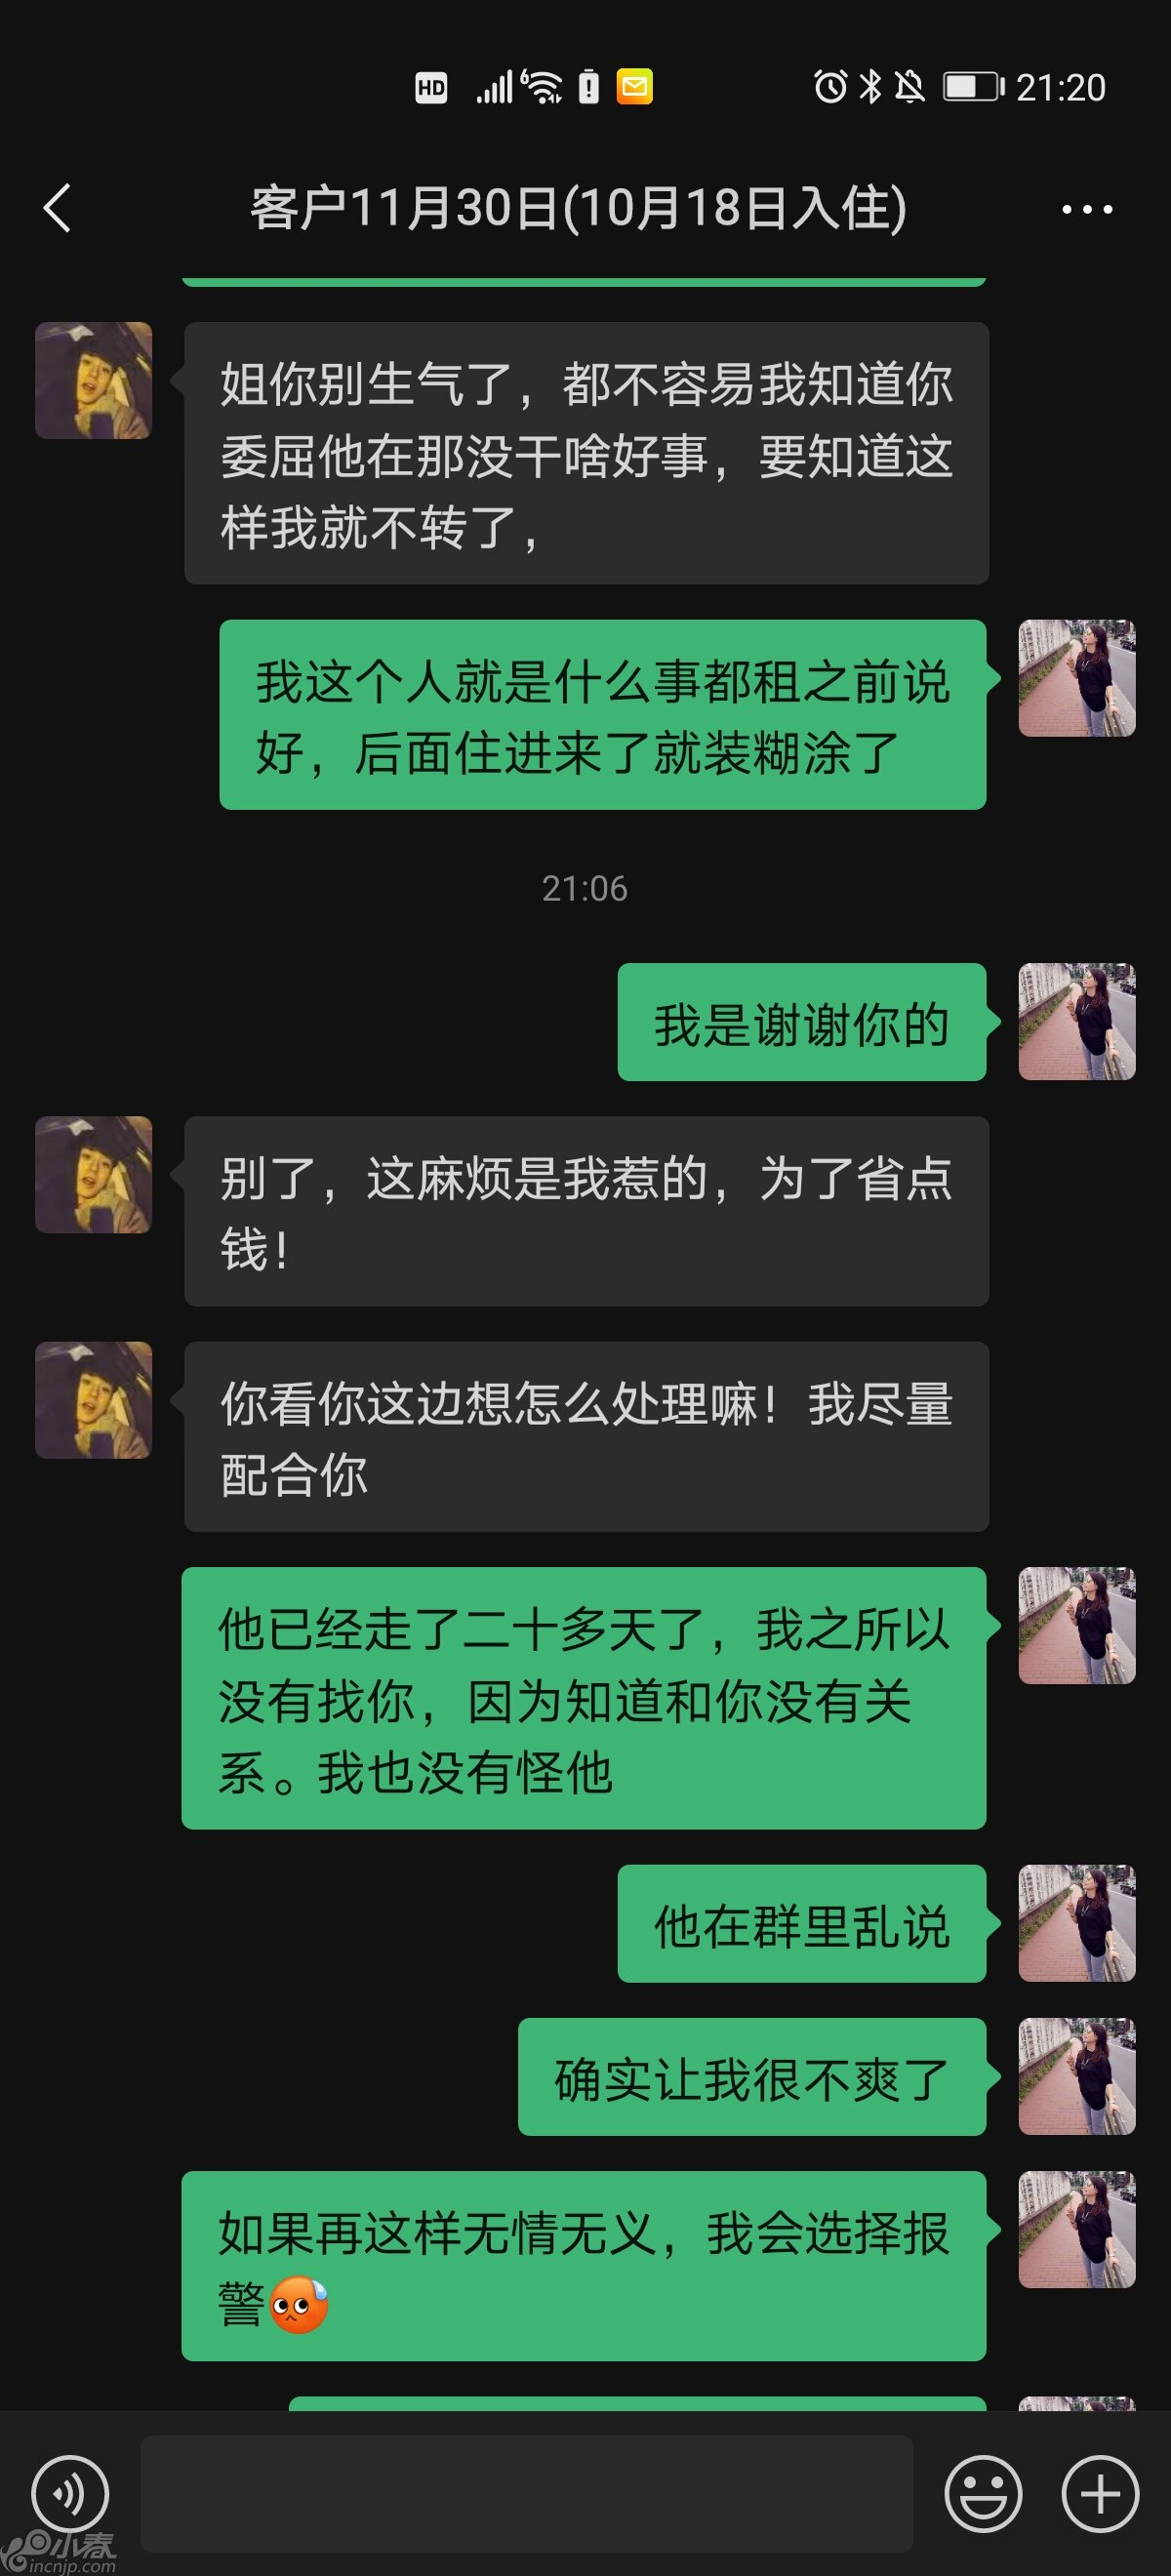 Screenshot_20210721_212050_com.tencent.mm.jpg